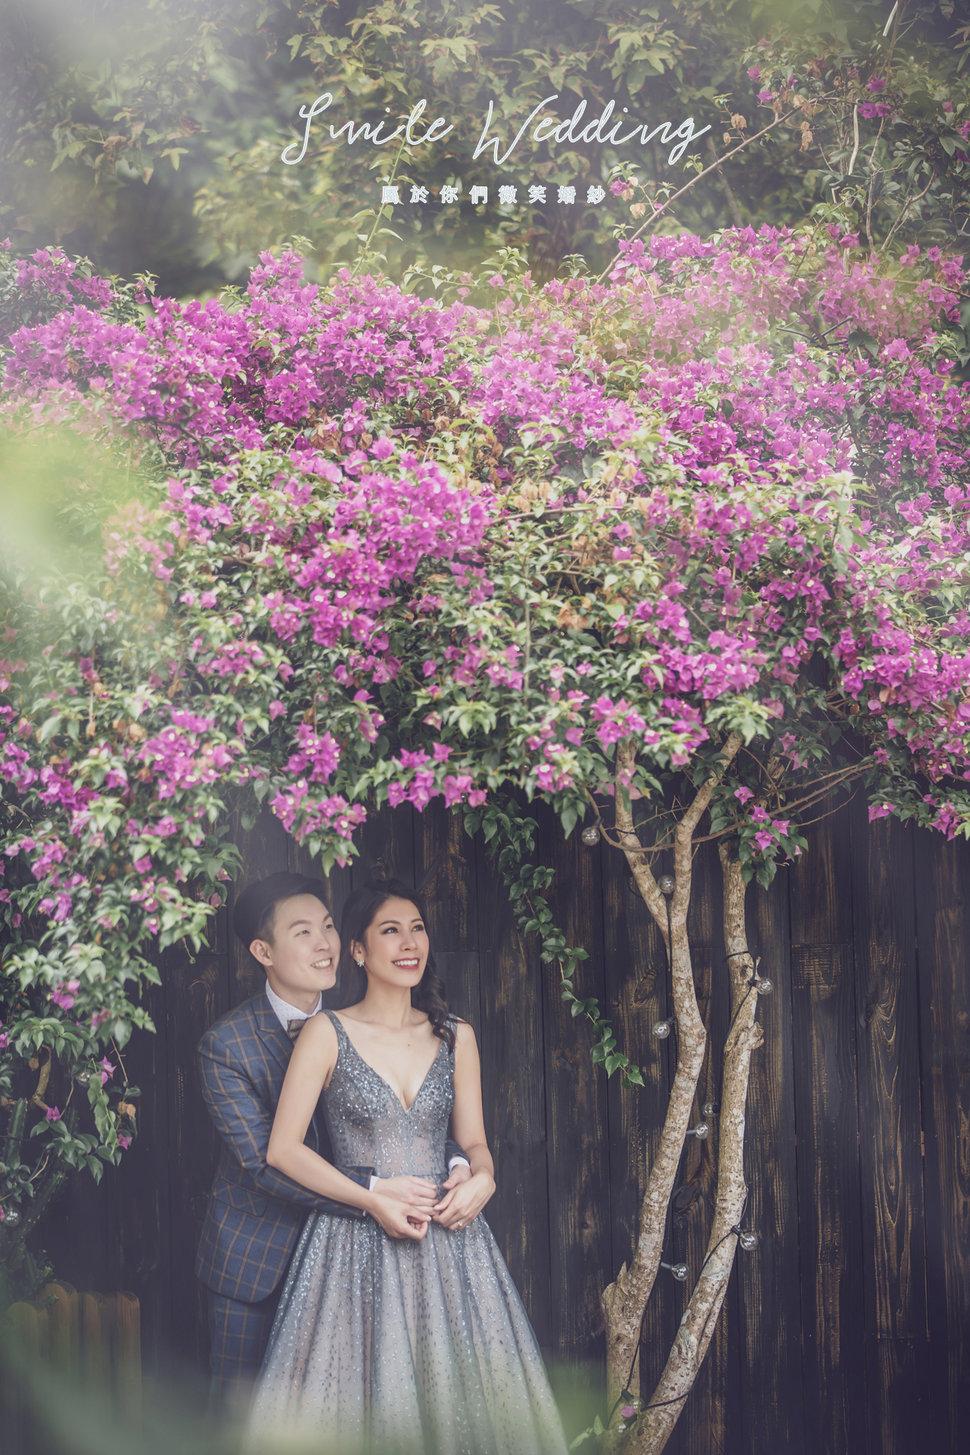 SIN_8720 - Smile wedding 微笑婚紗《結婚吧》